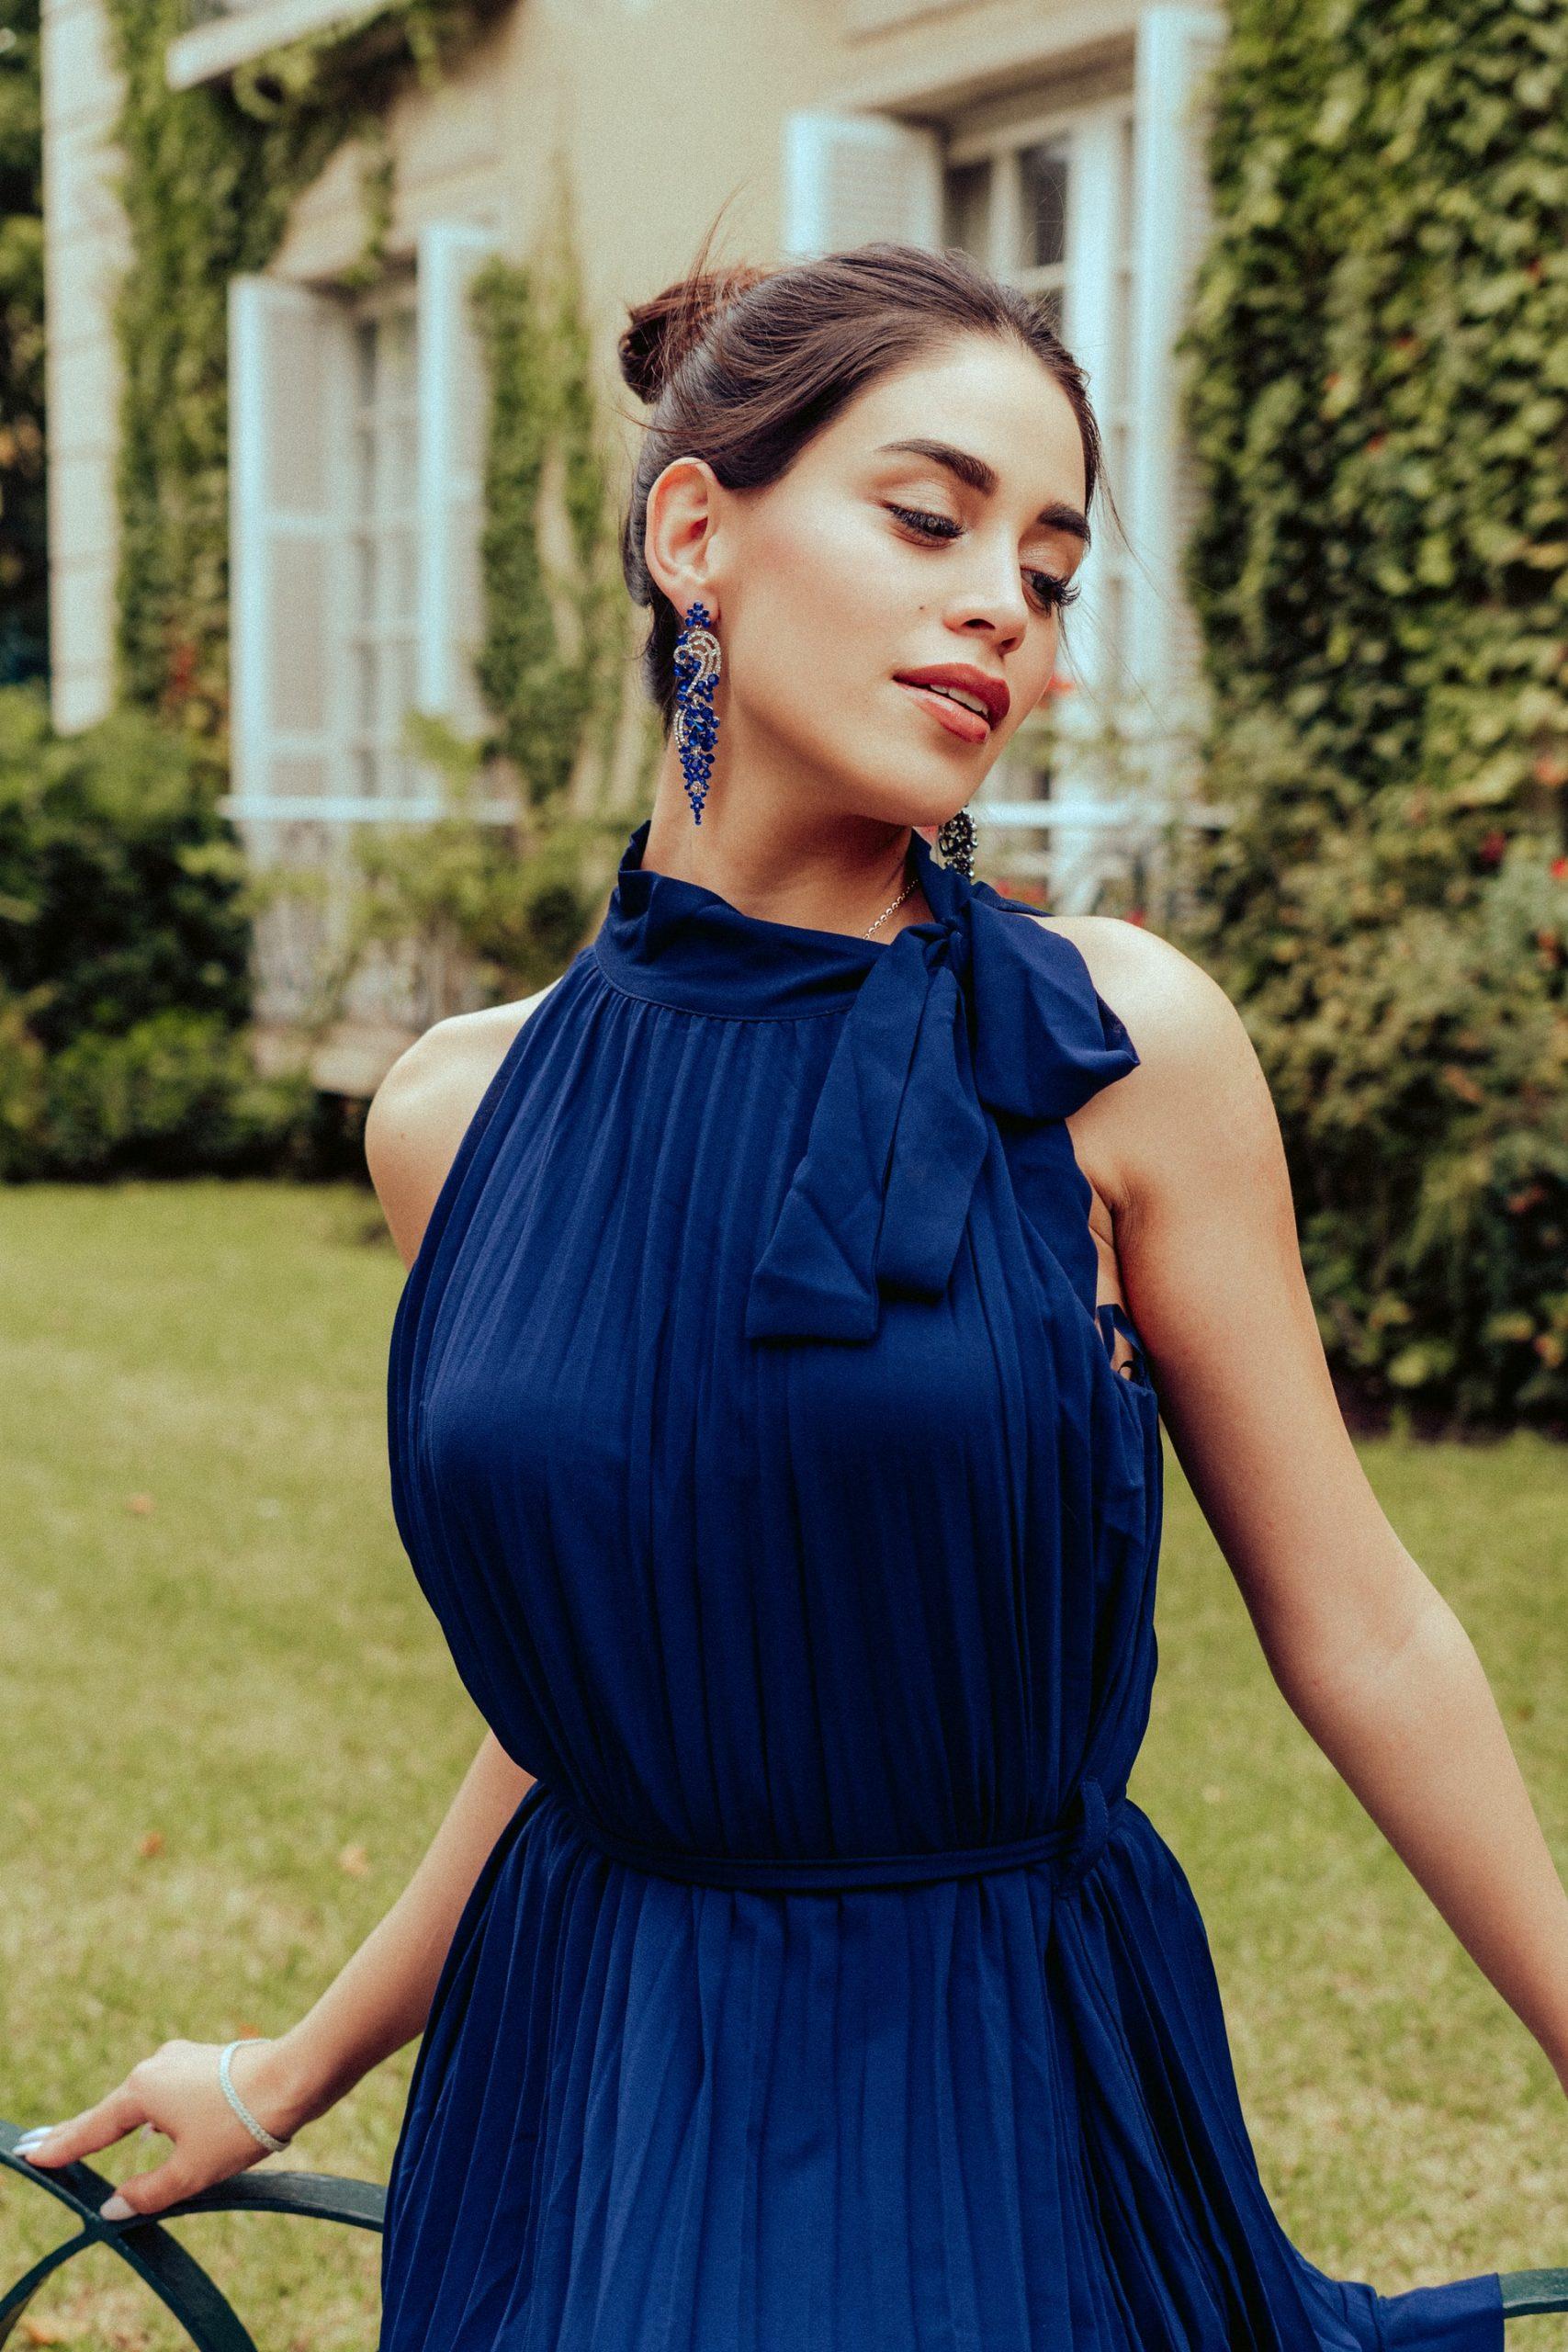 woman-blue-dress